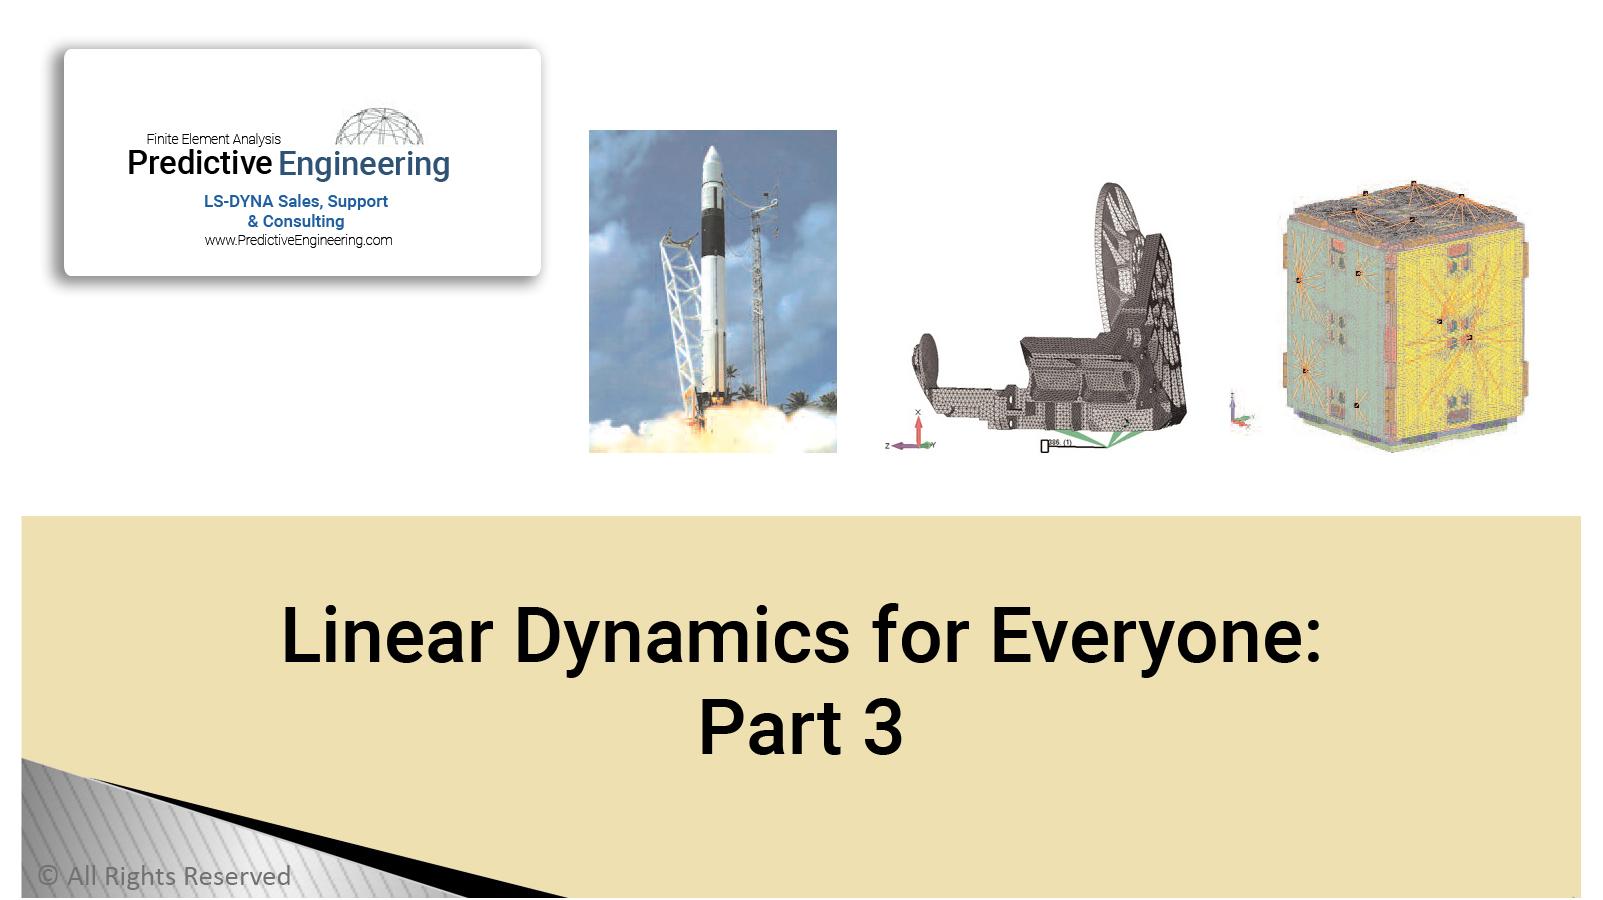 Linear Dynamics part 3